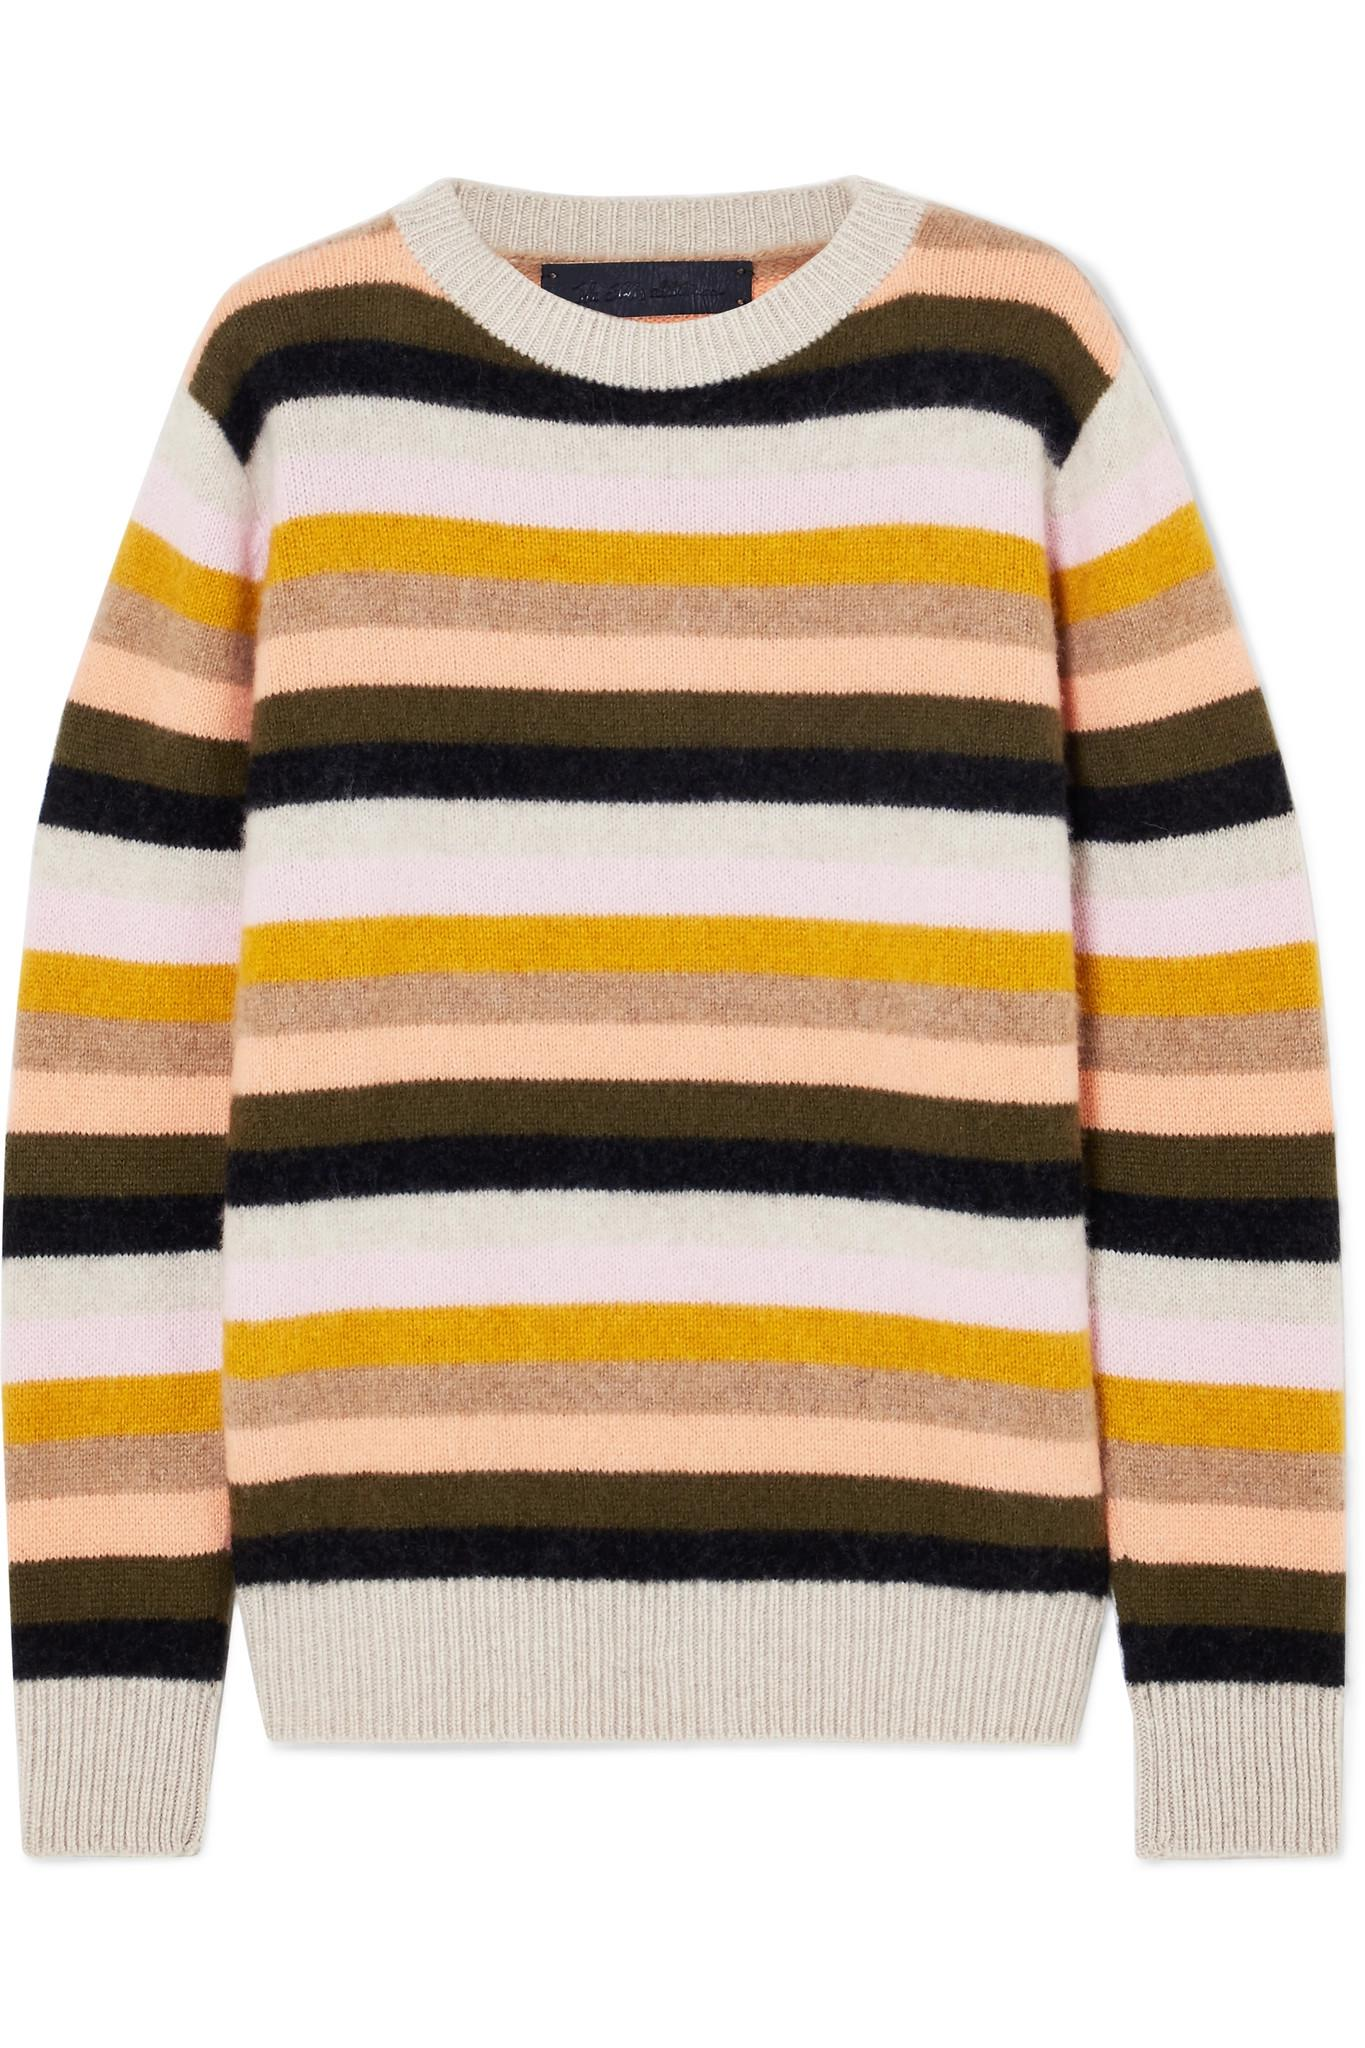 Classic striped sweater - Yellow & Orange The Elder Statesman Wiki Buy Cheap Best Seller y9hVKPwCZ